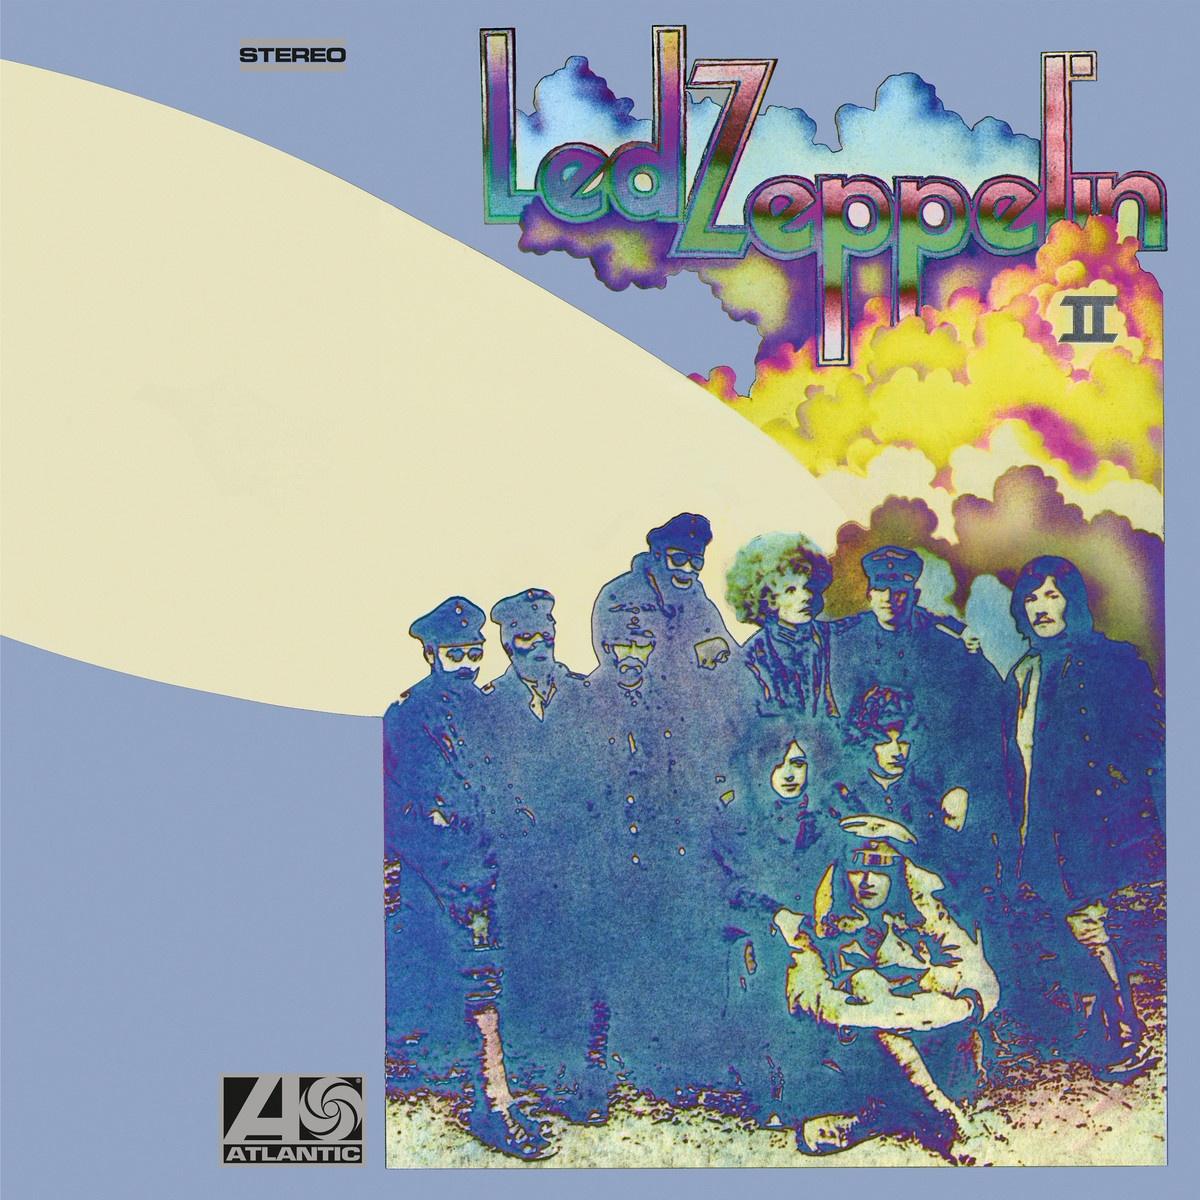 Led Zeppelin II (Deluxe Edition)